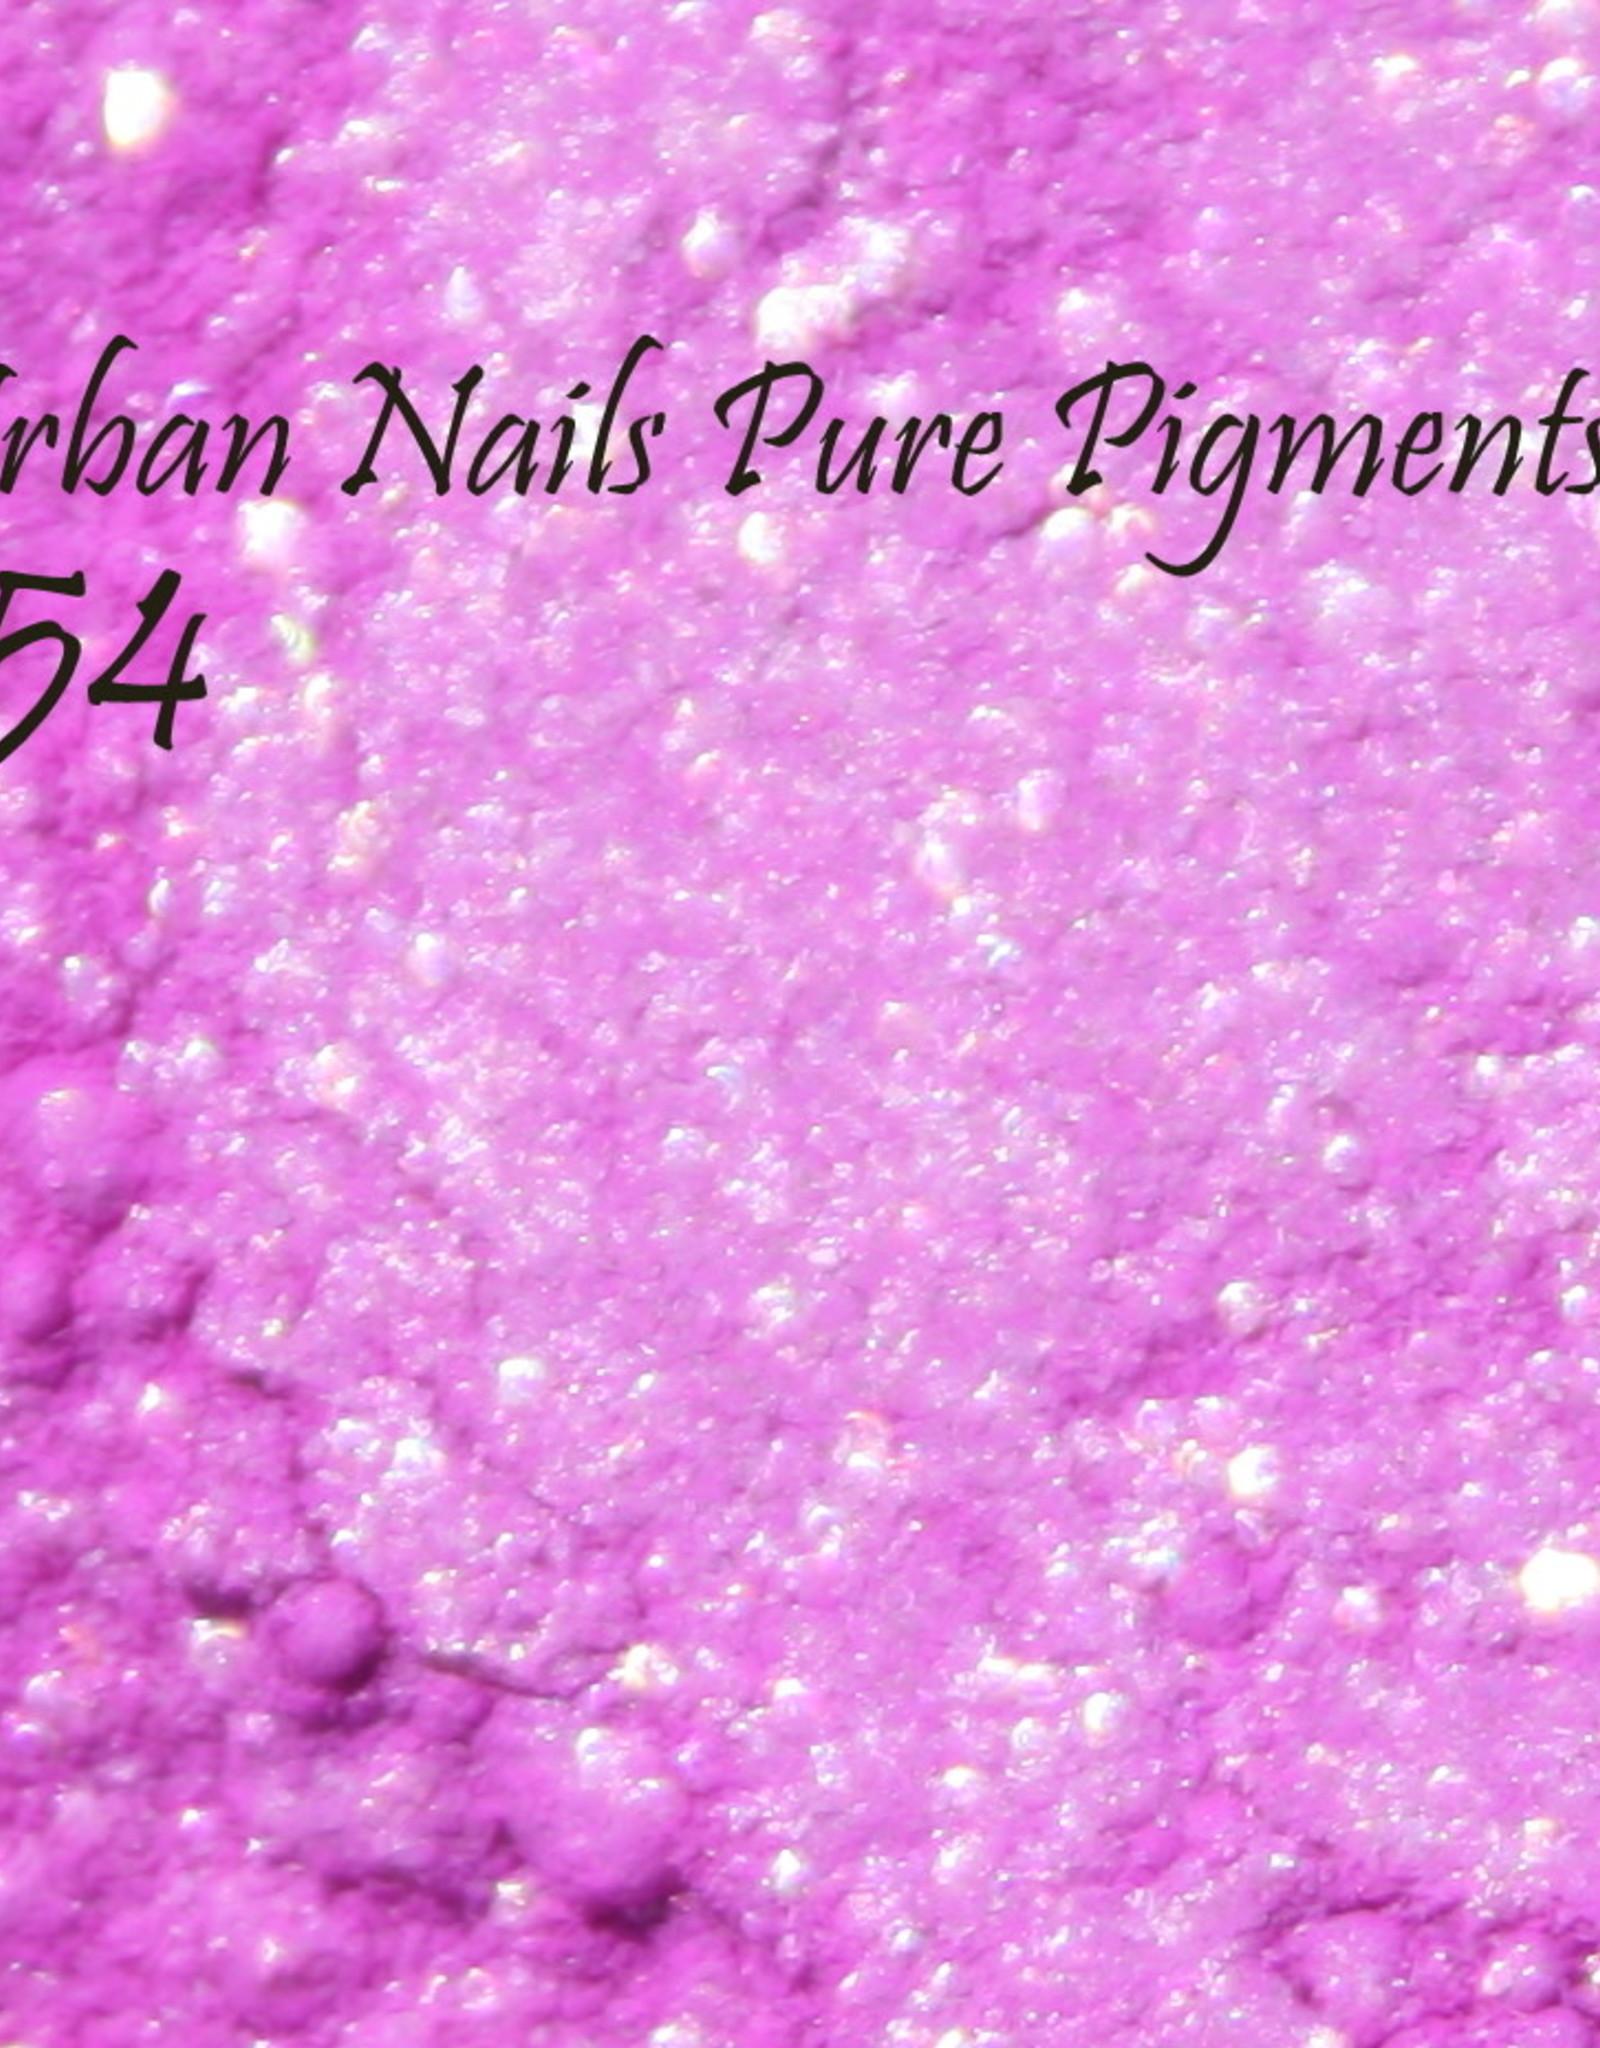 Urban Nails Pure Pigment 54